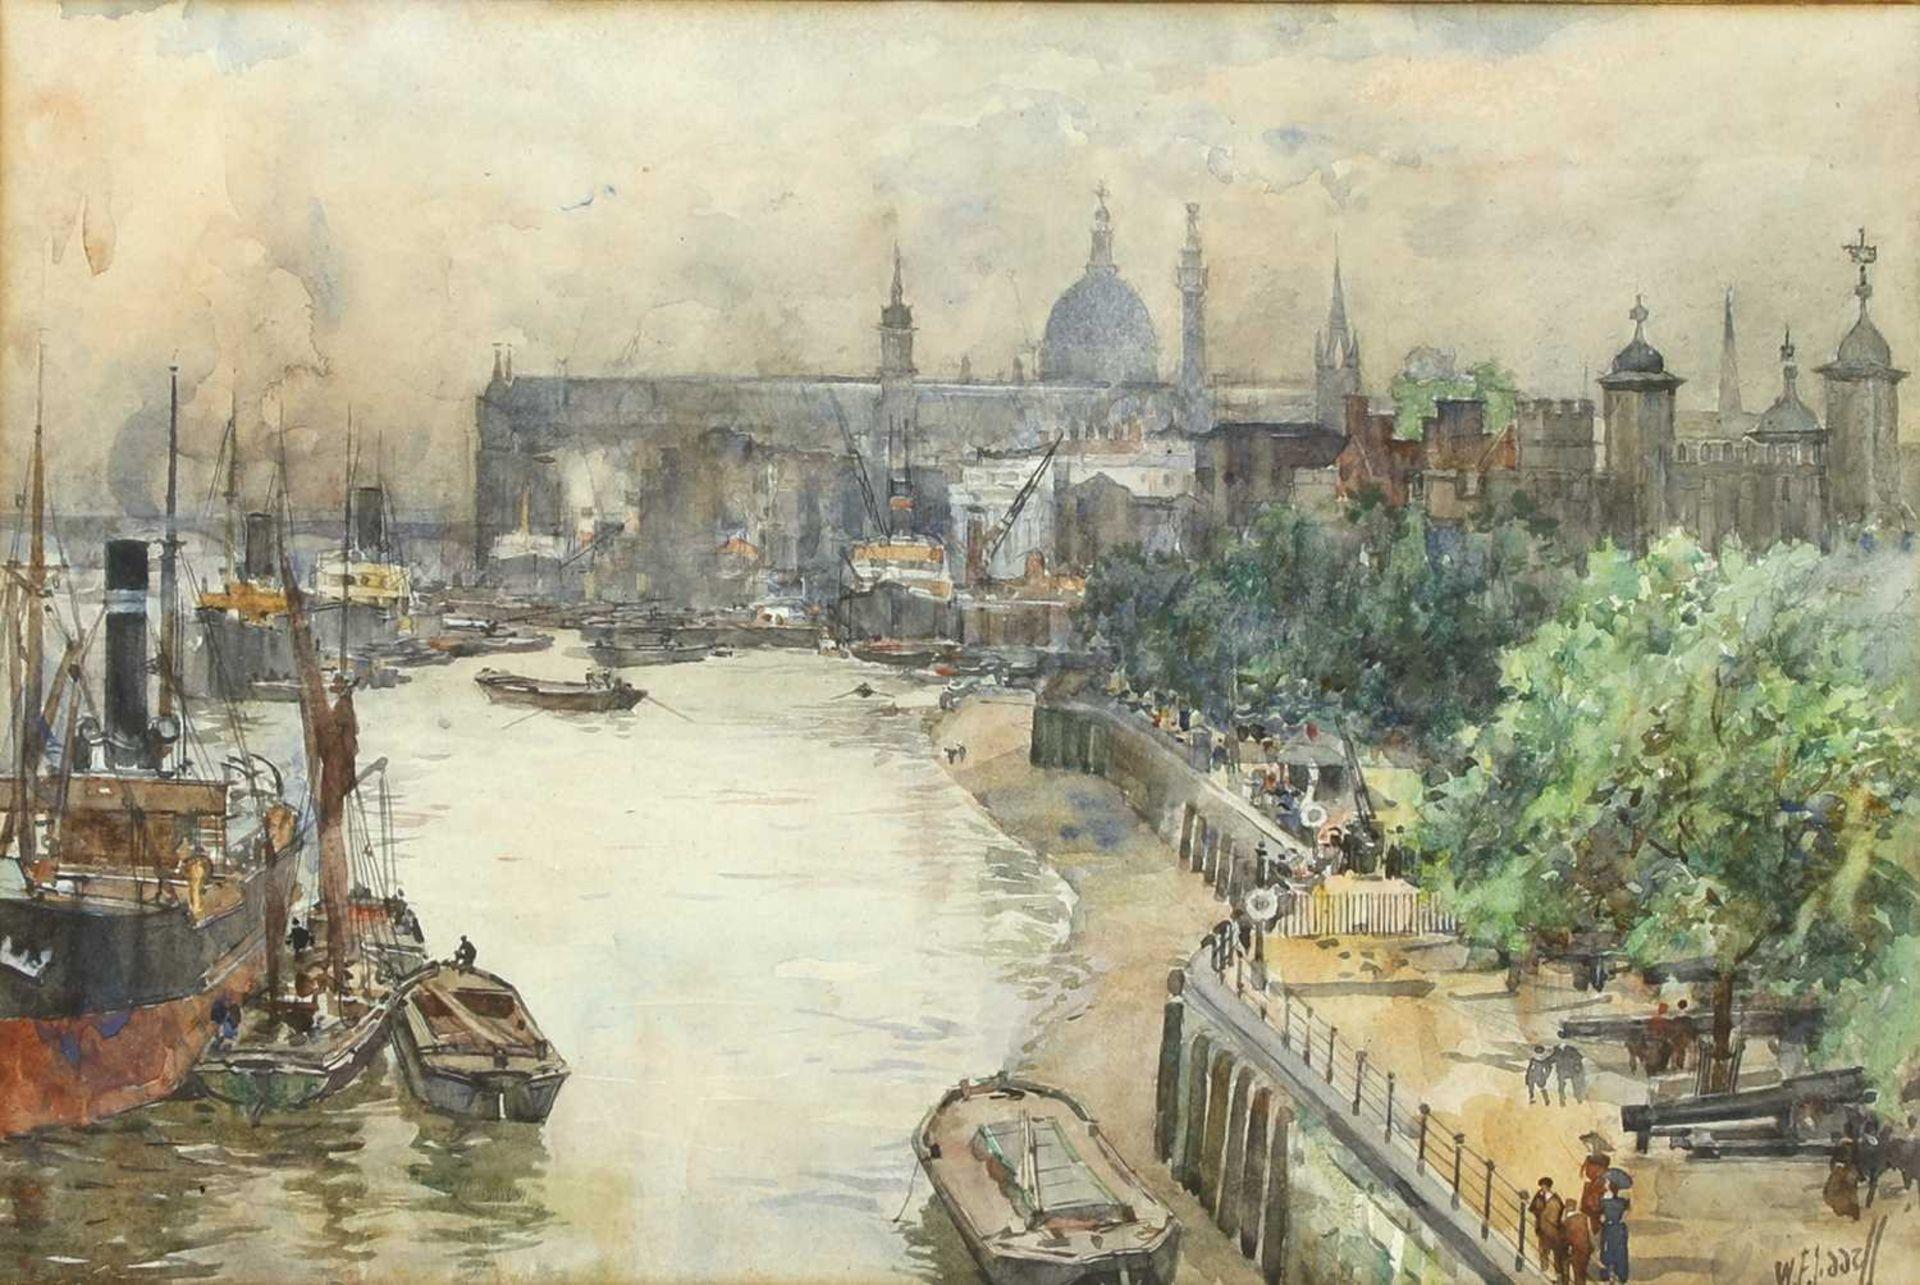 WILLIAM FREDERICK LIDDELL (fl.1905-1927)